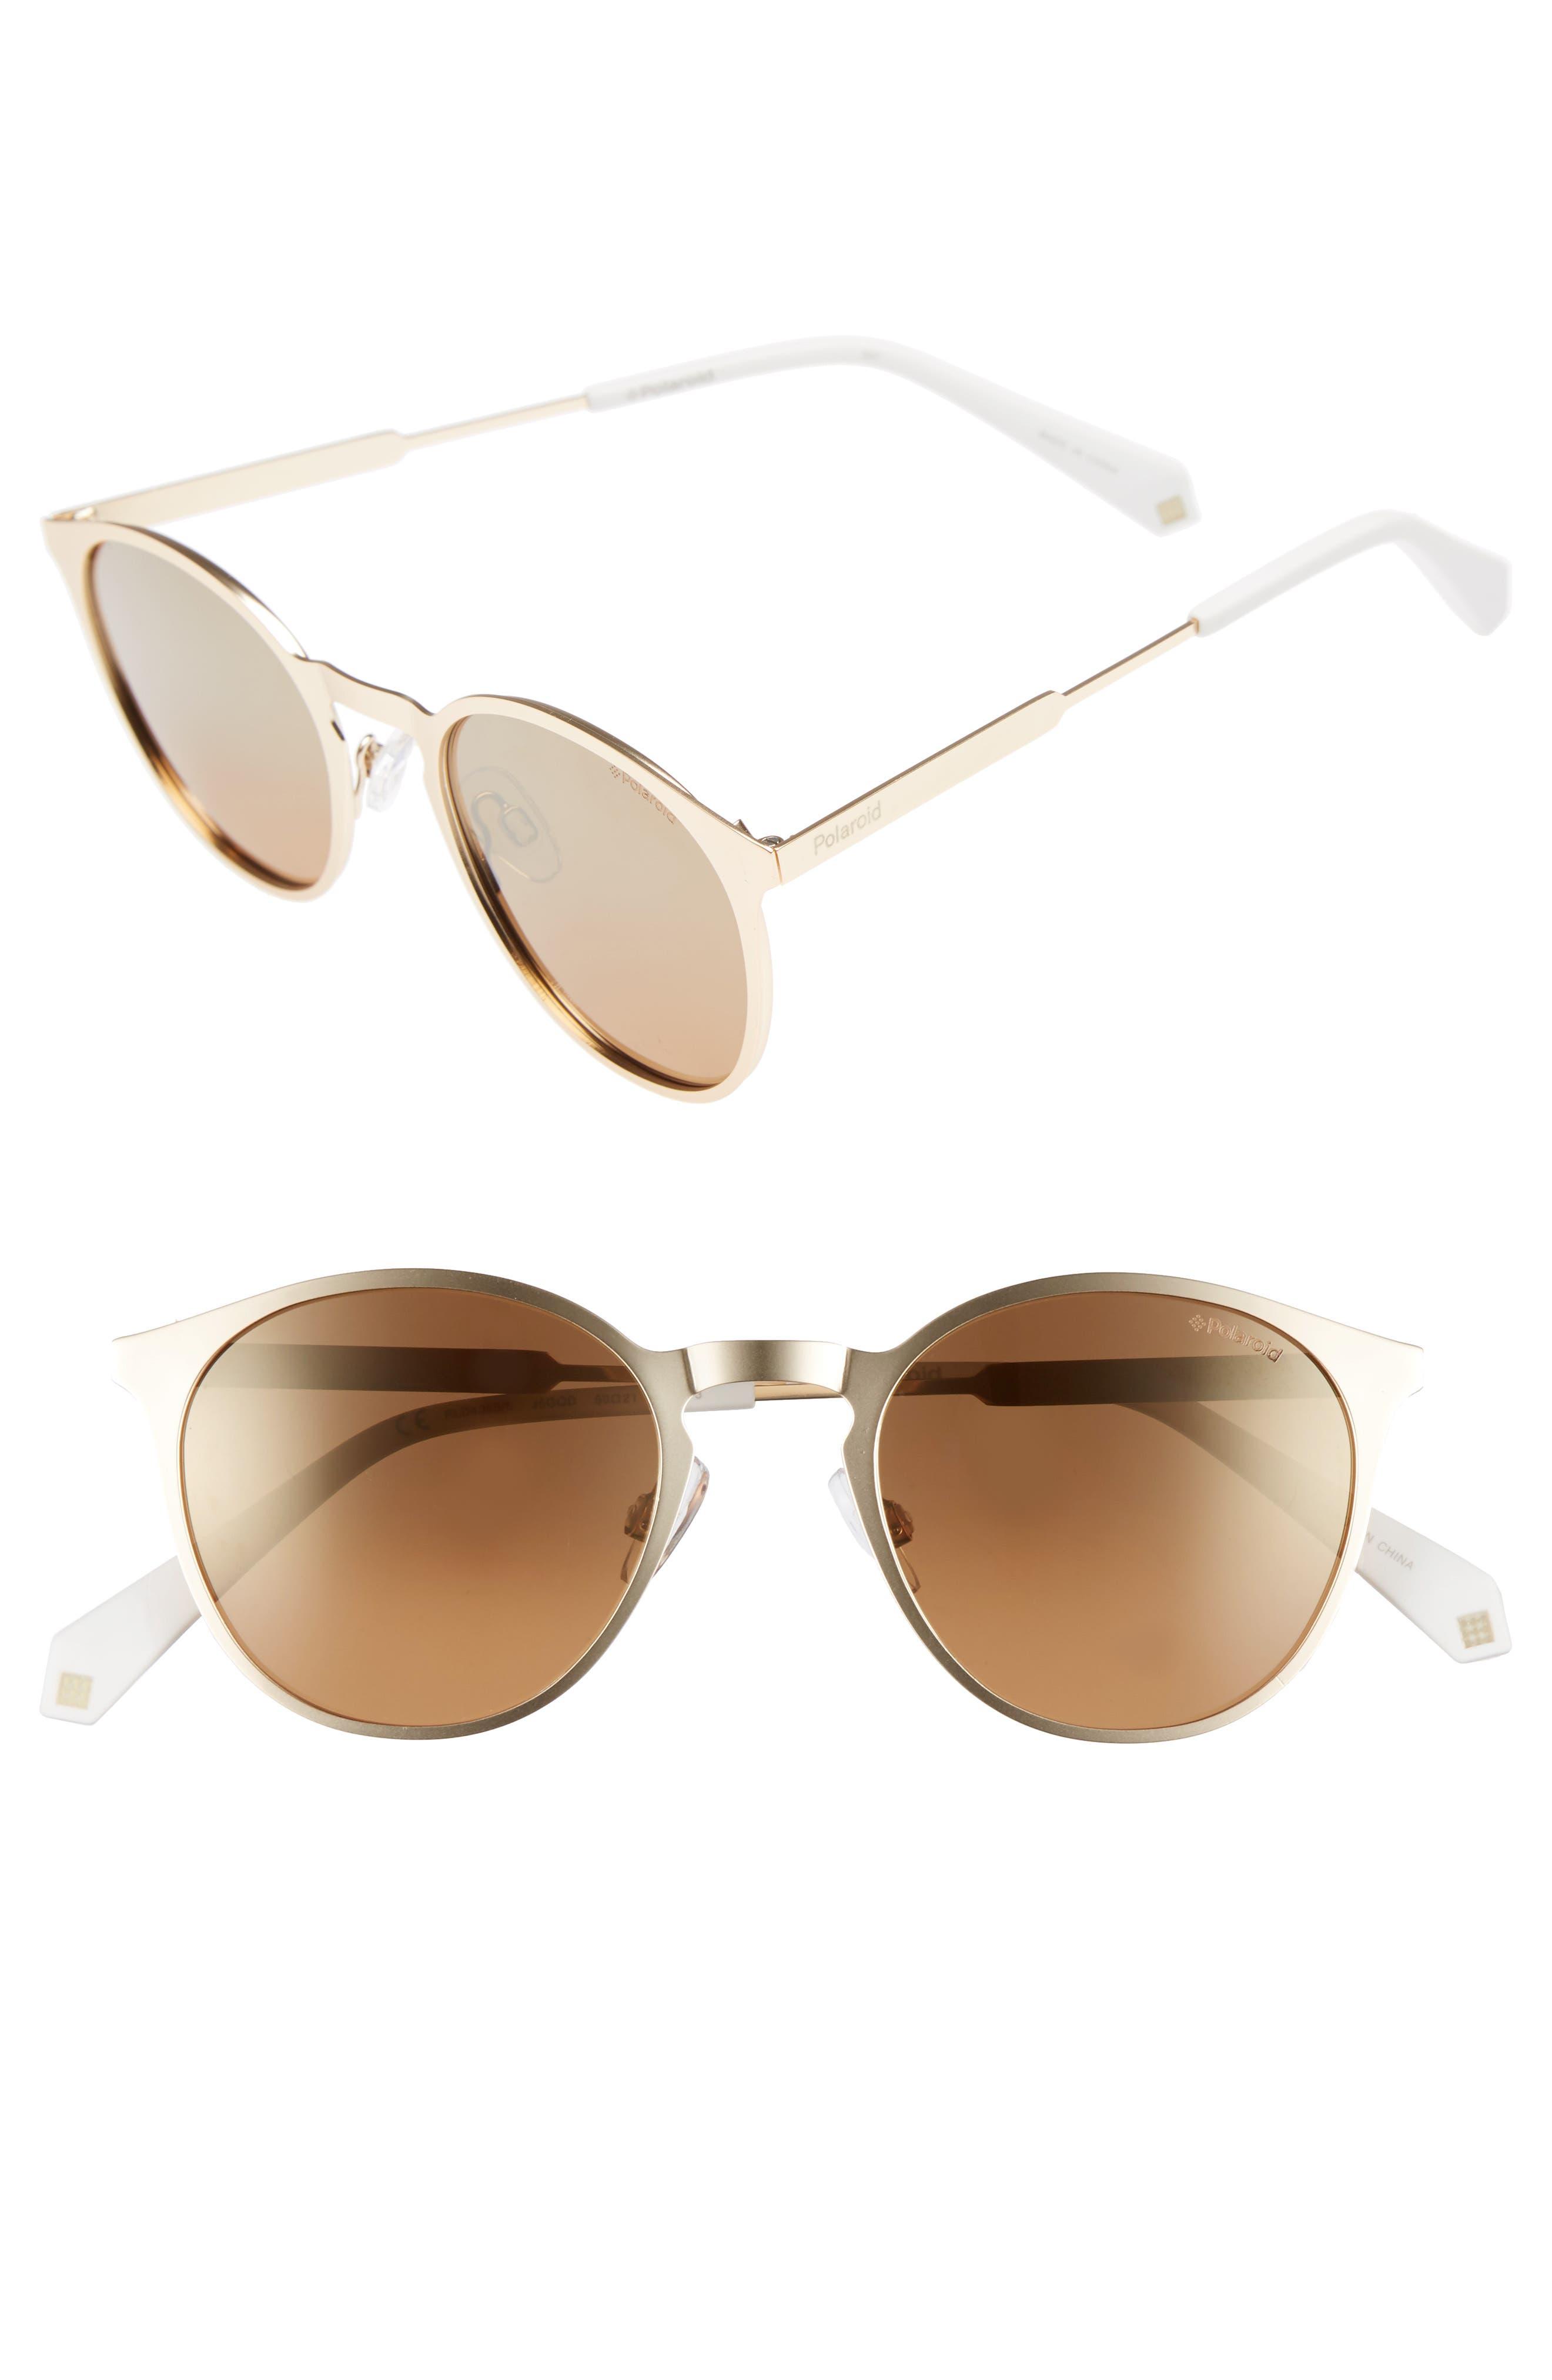 50mm Round Polarized Sunglasses,                         Main,                         color, GOLD